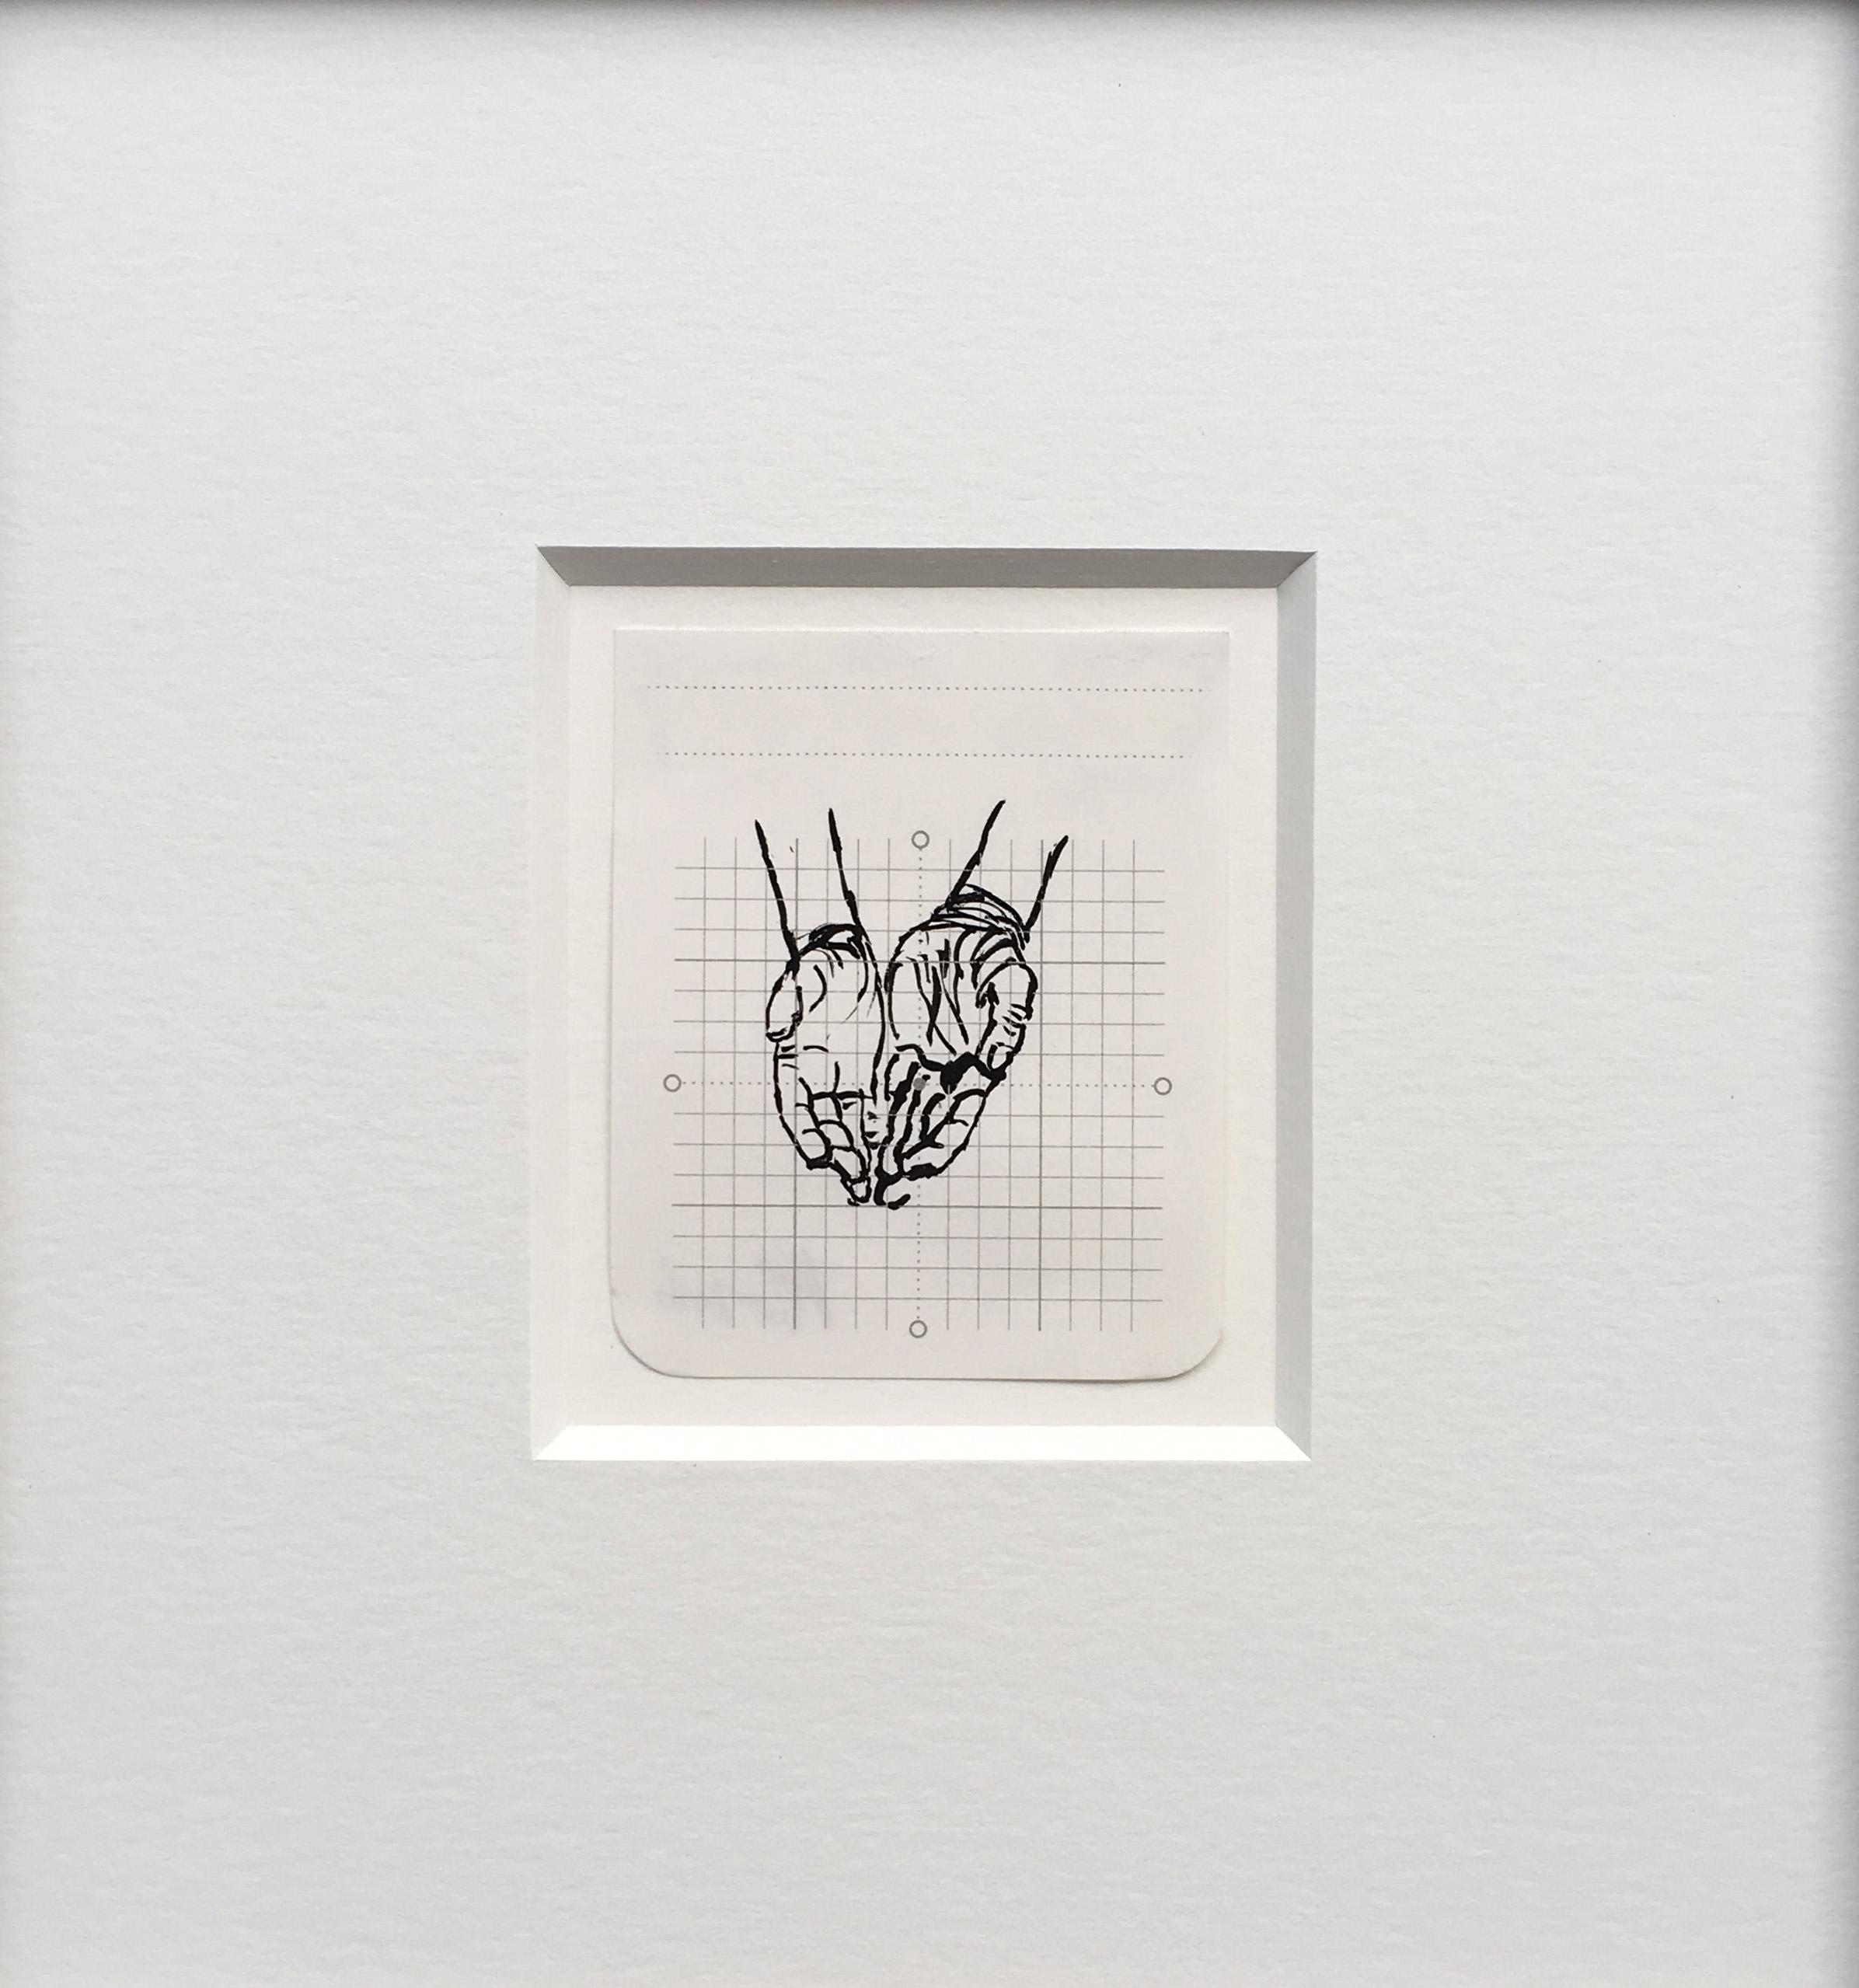 HANDS, 2016, polymer gouache on paper, 8 x 6.5 cm © Anita Groener glass, 23 x 21.5 cm(f)